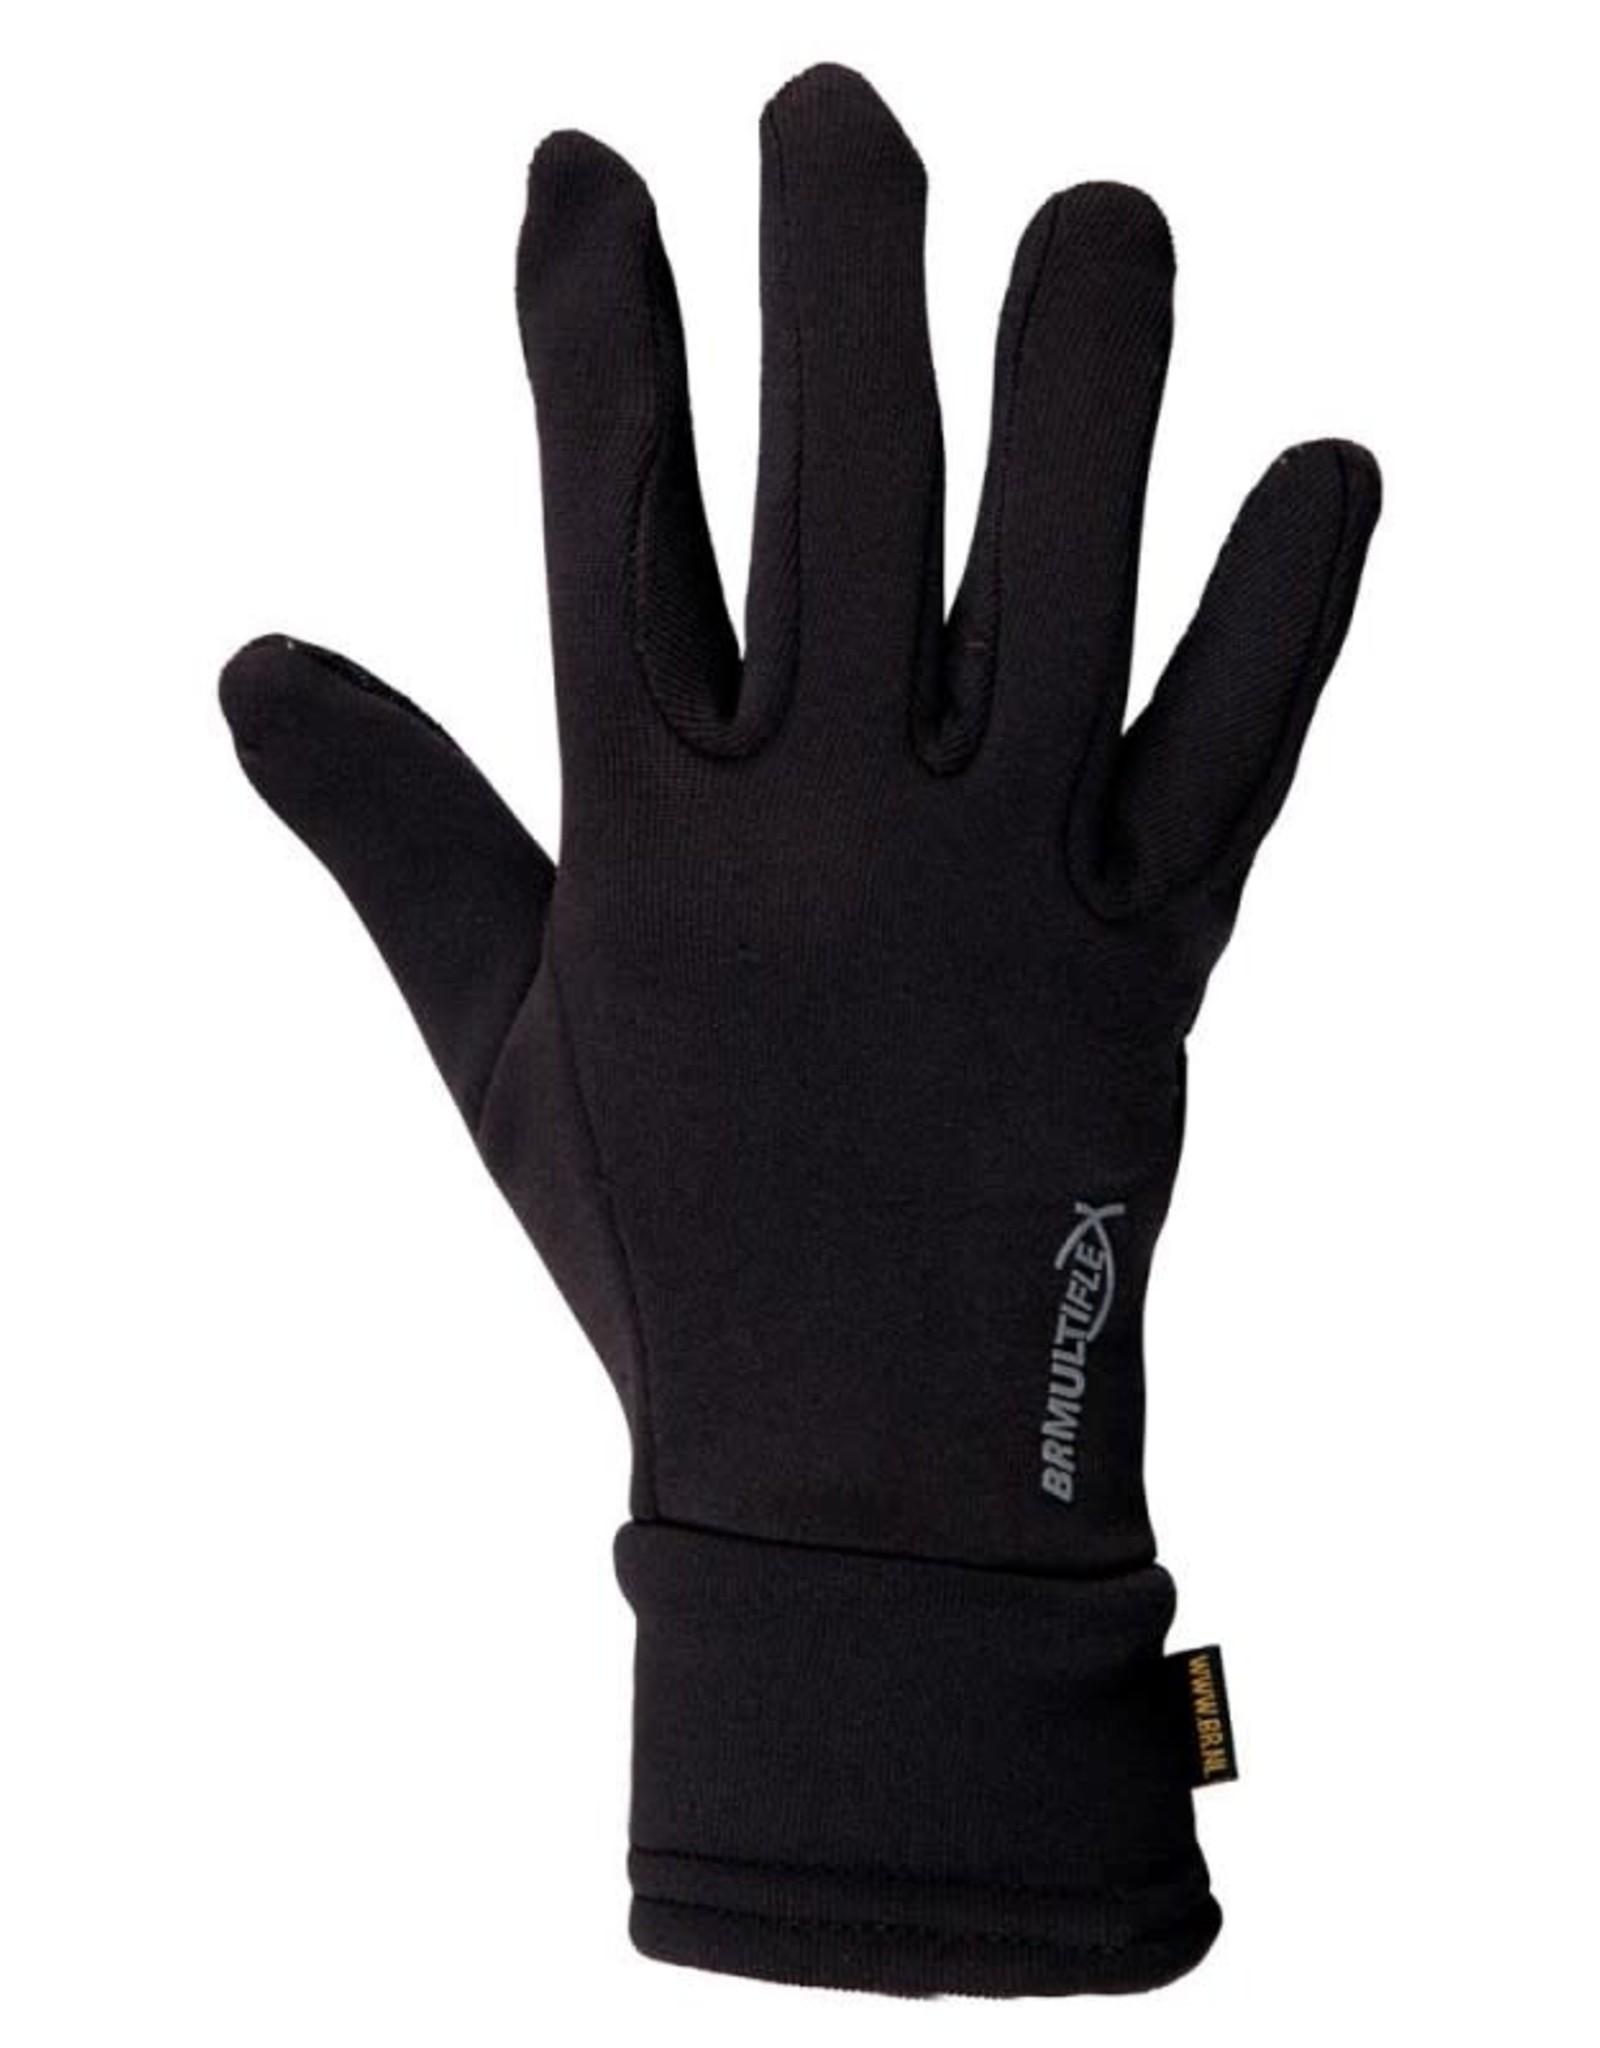 BR BR winterhandschoenen multiflex zwart